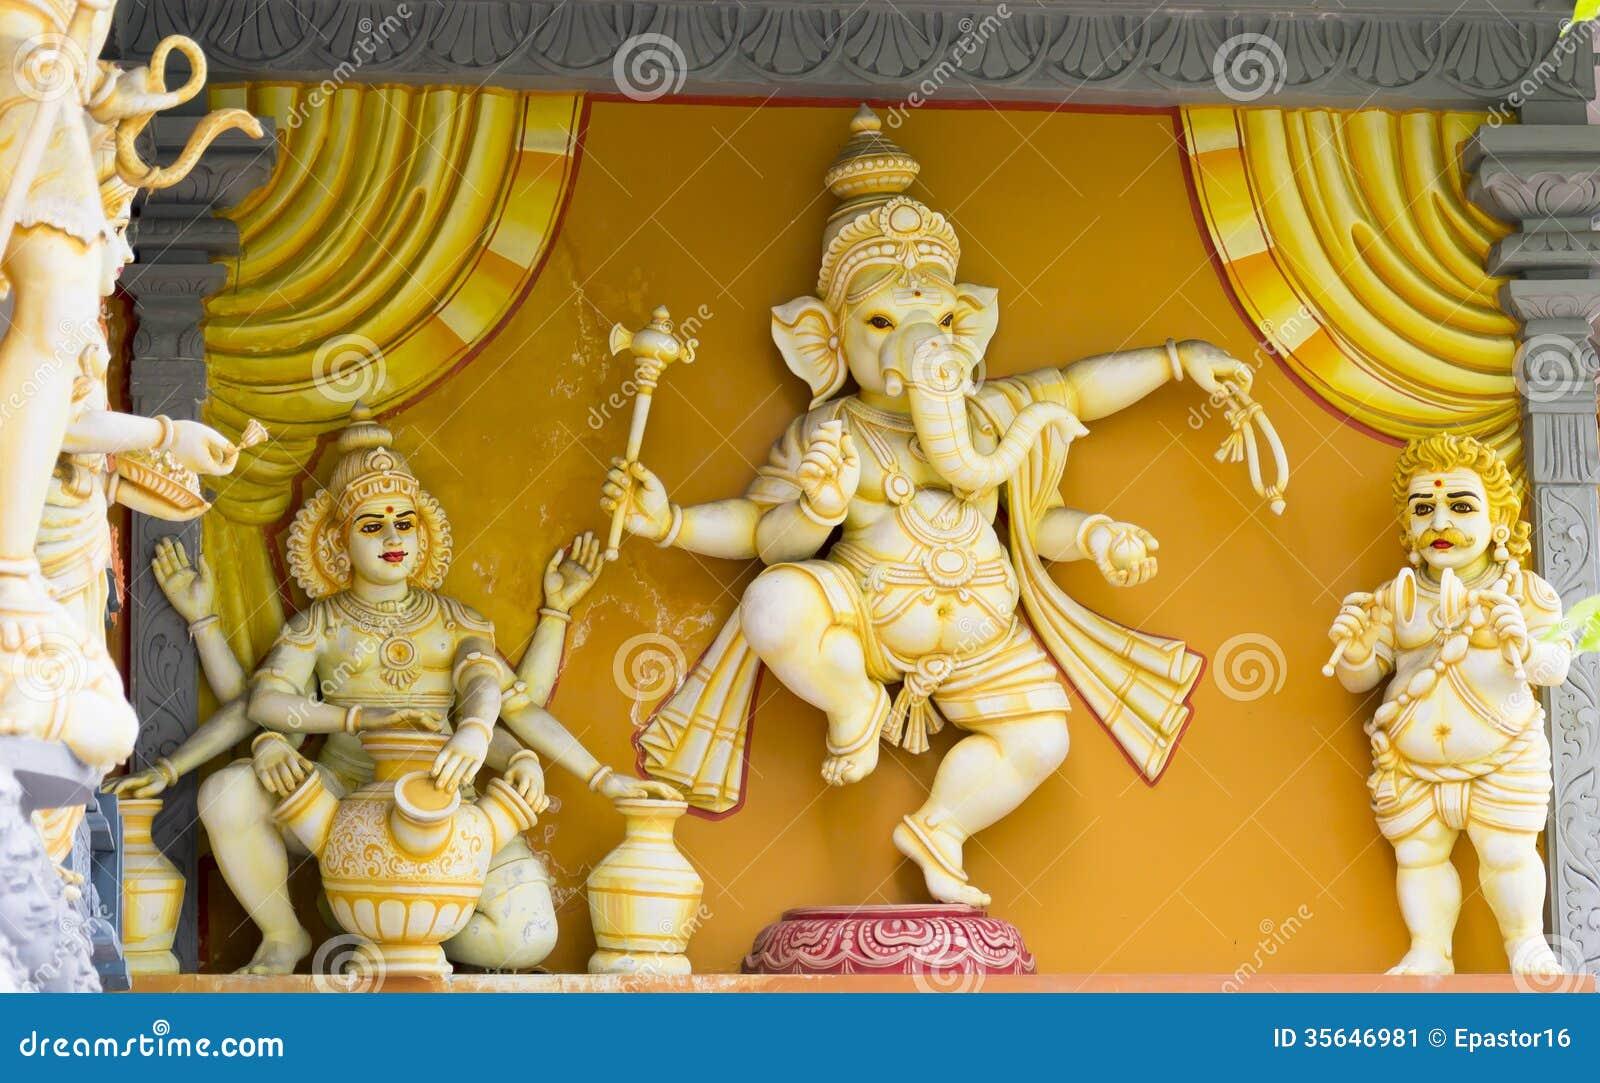 Elefant-Gott Ganesh Statue